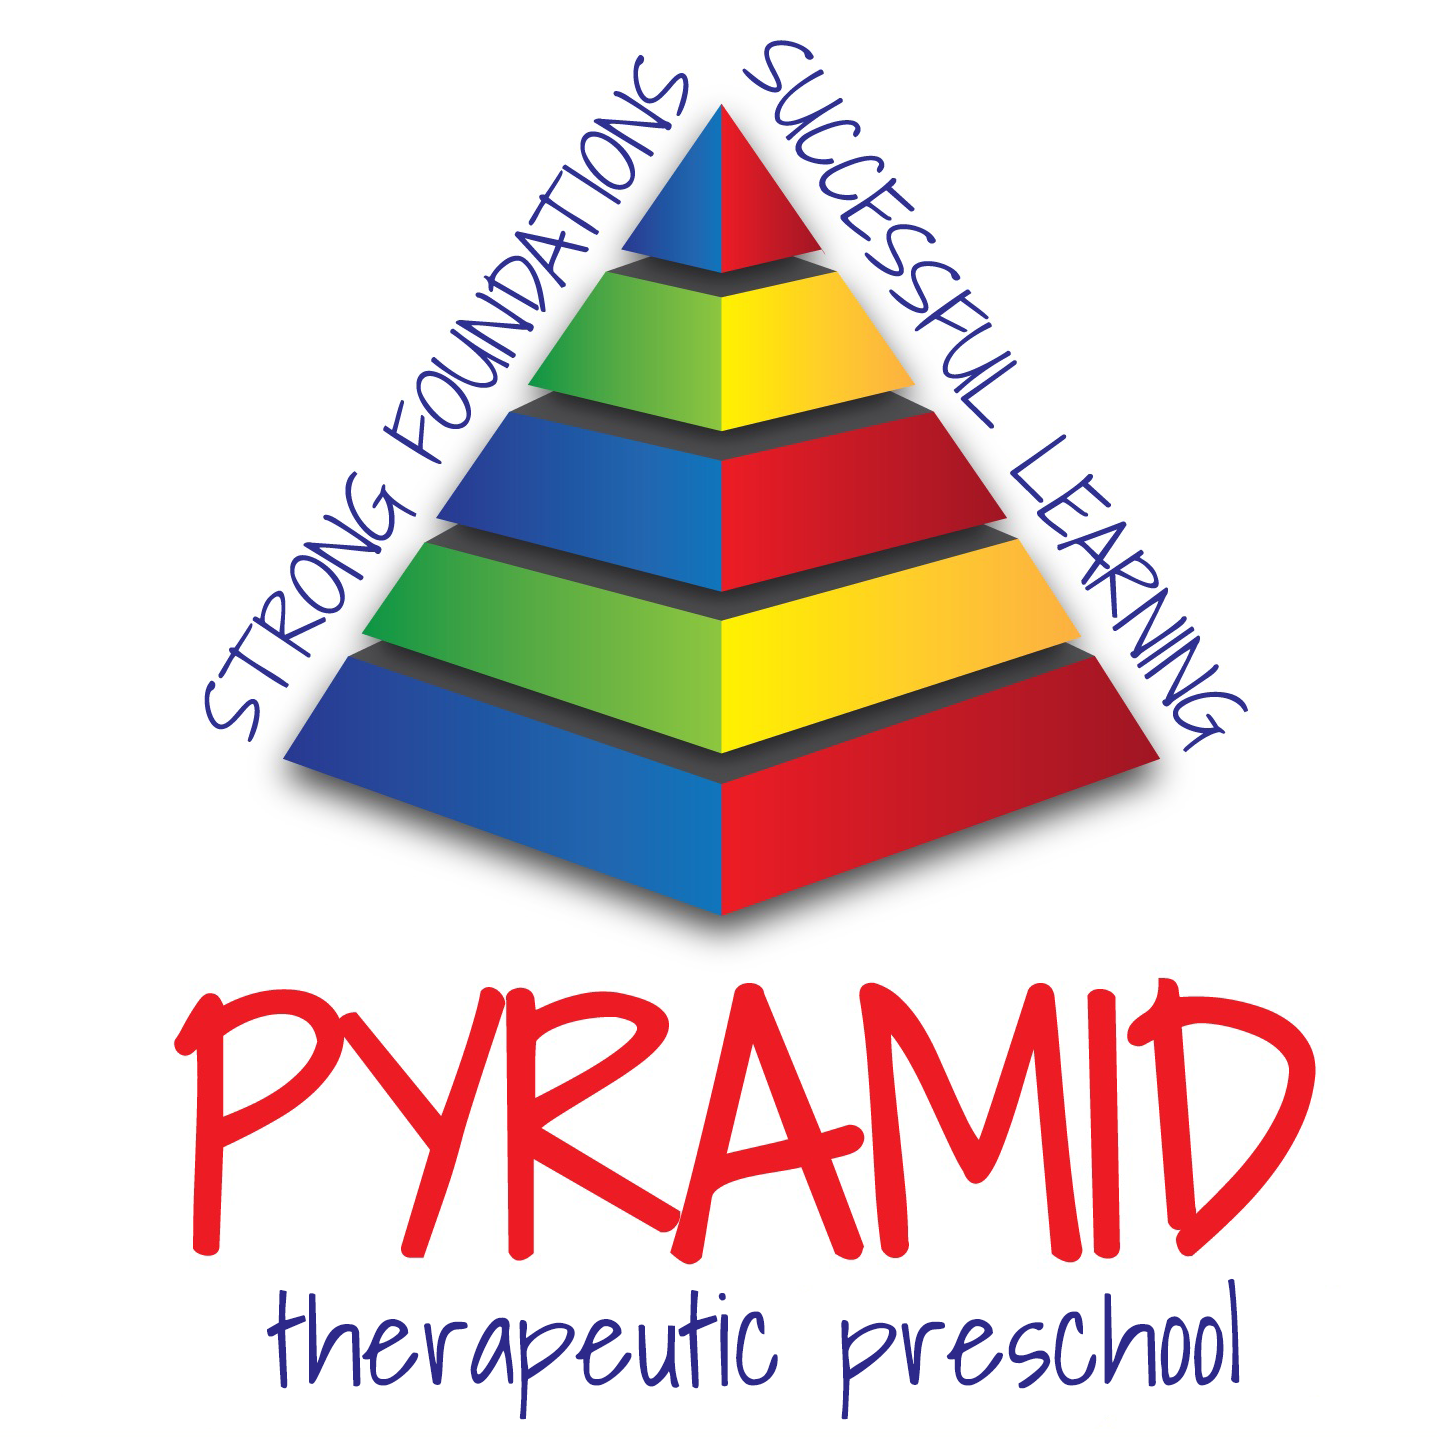 Pyramid Therapeutic Preschool Logo